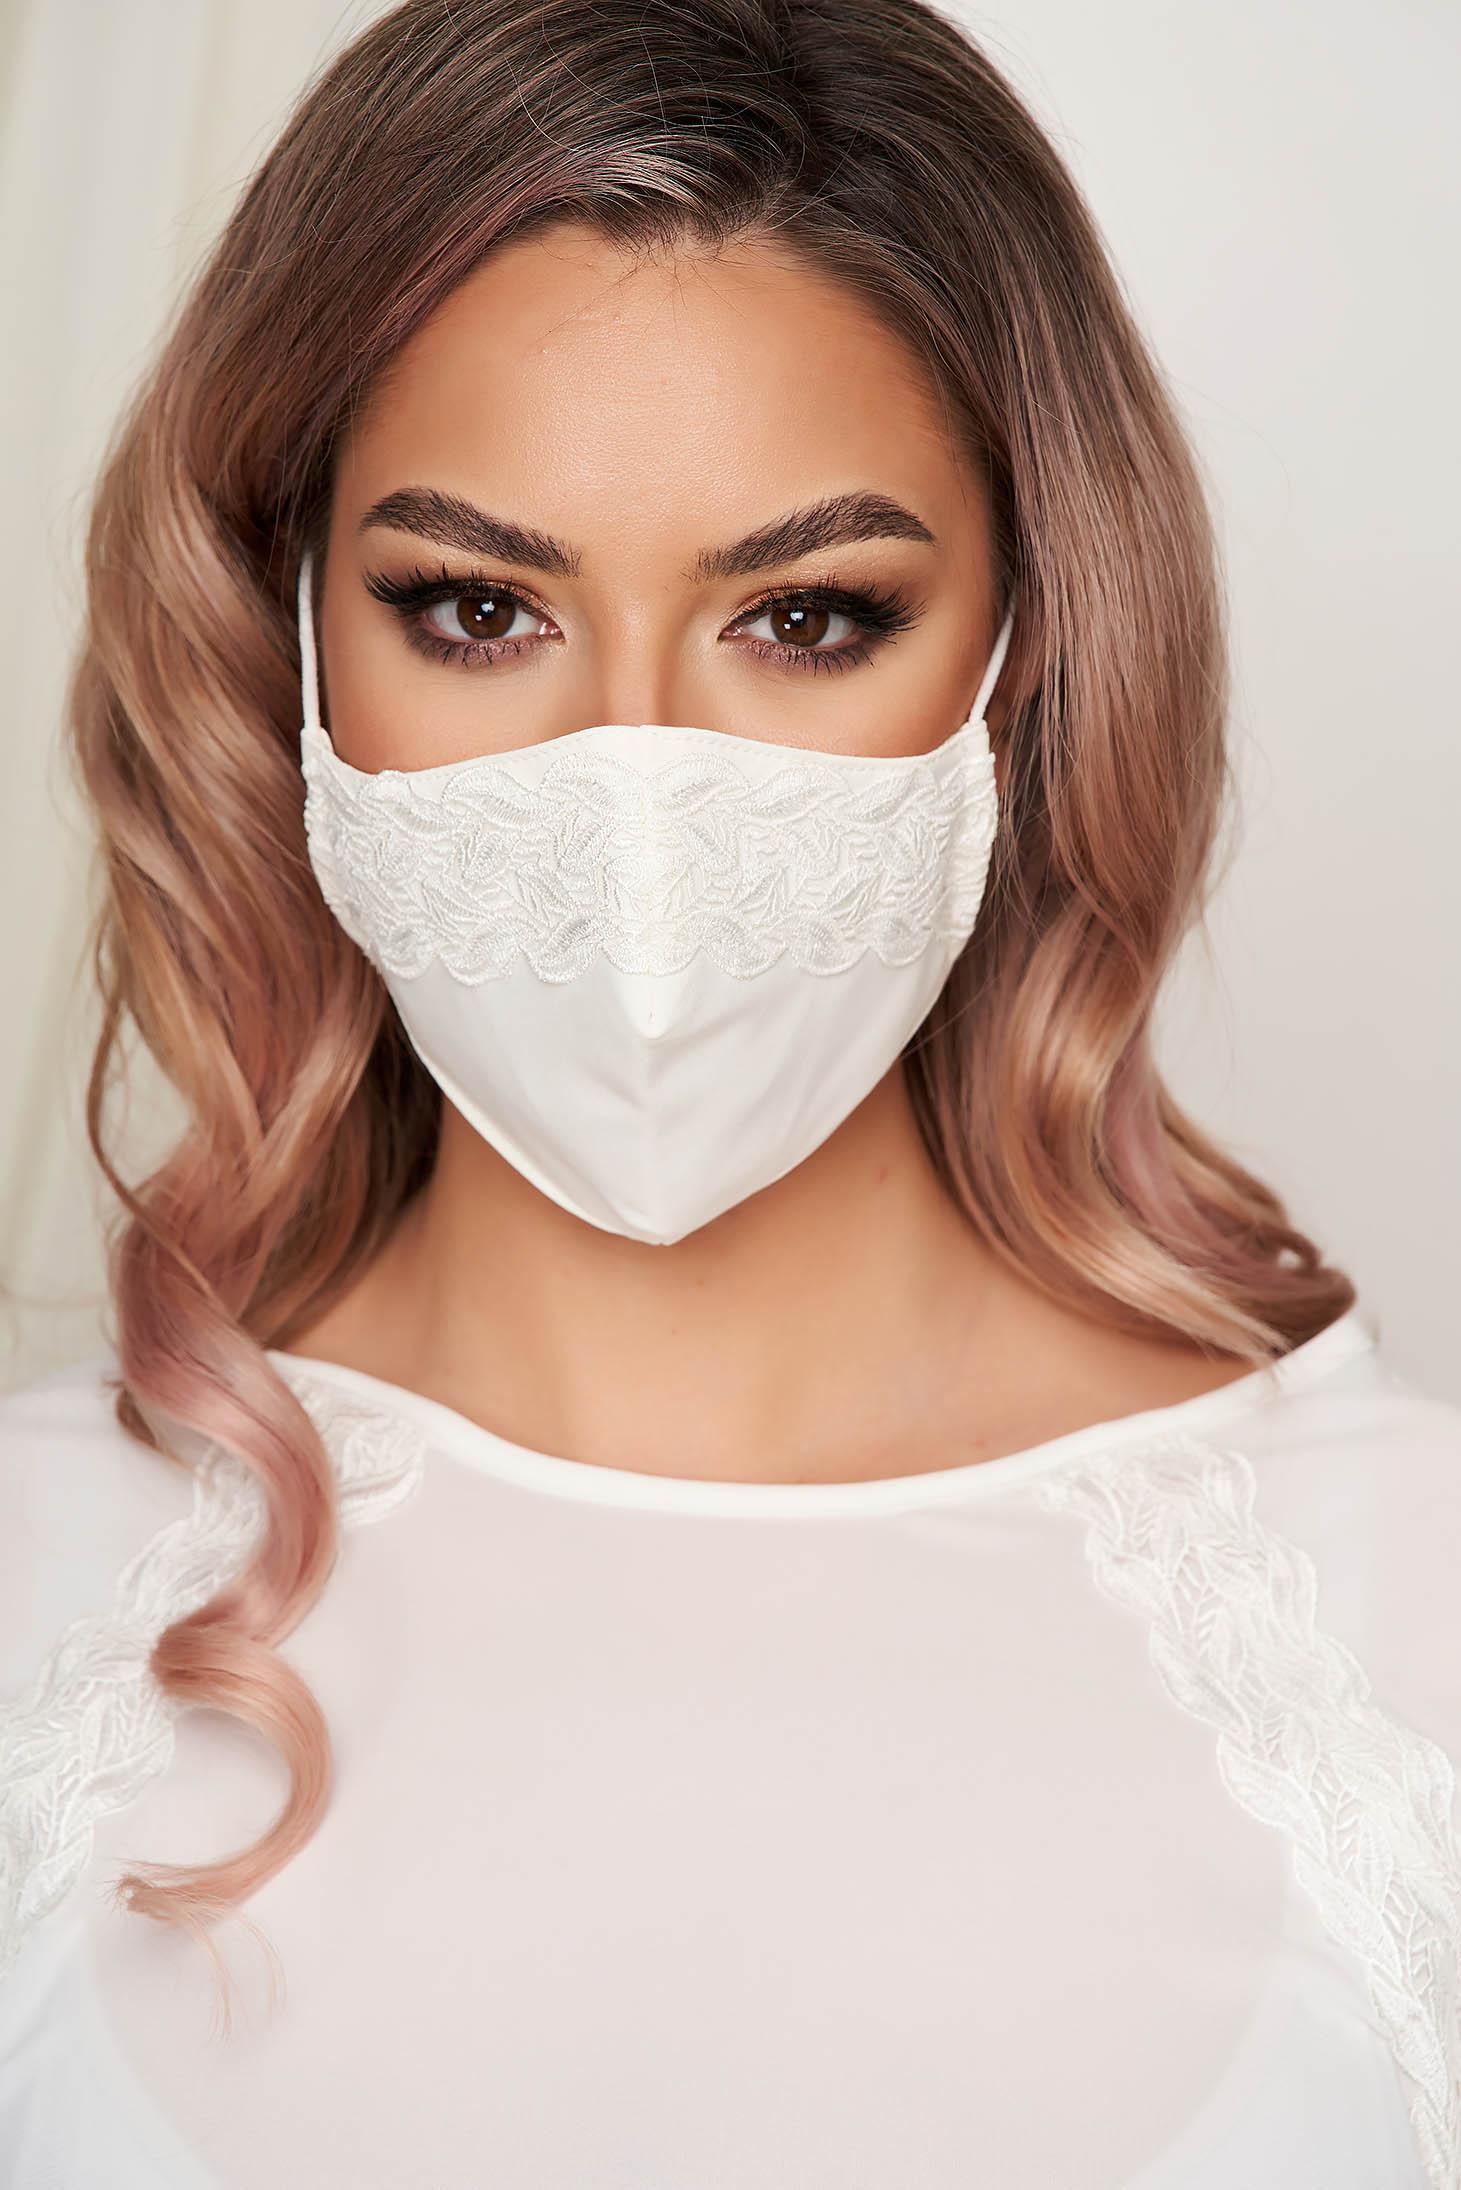 Masca textila pentru femei StarShinerS ivoire